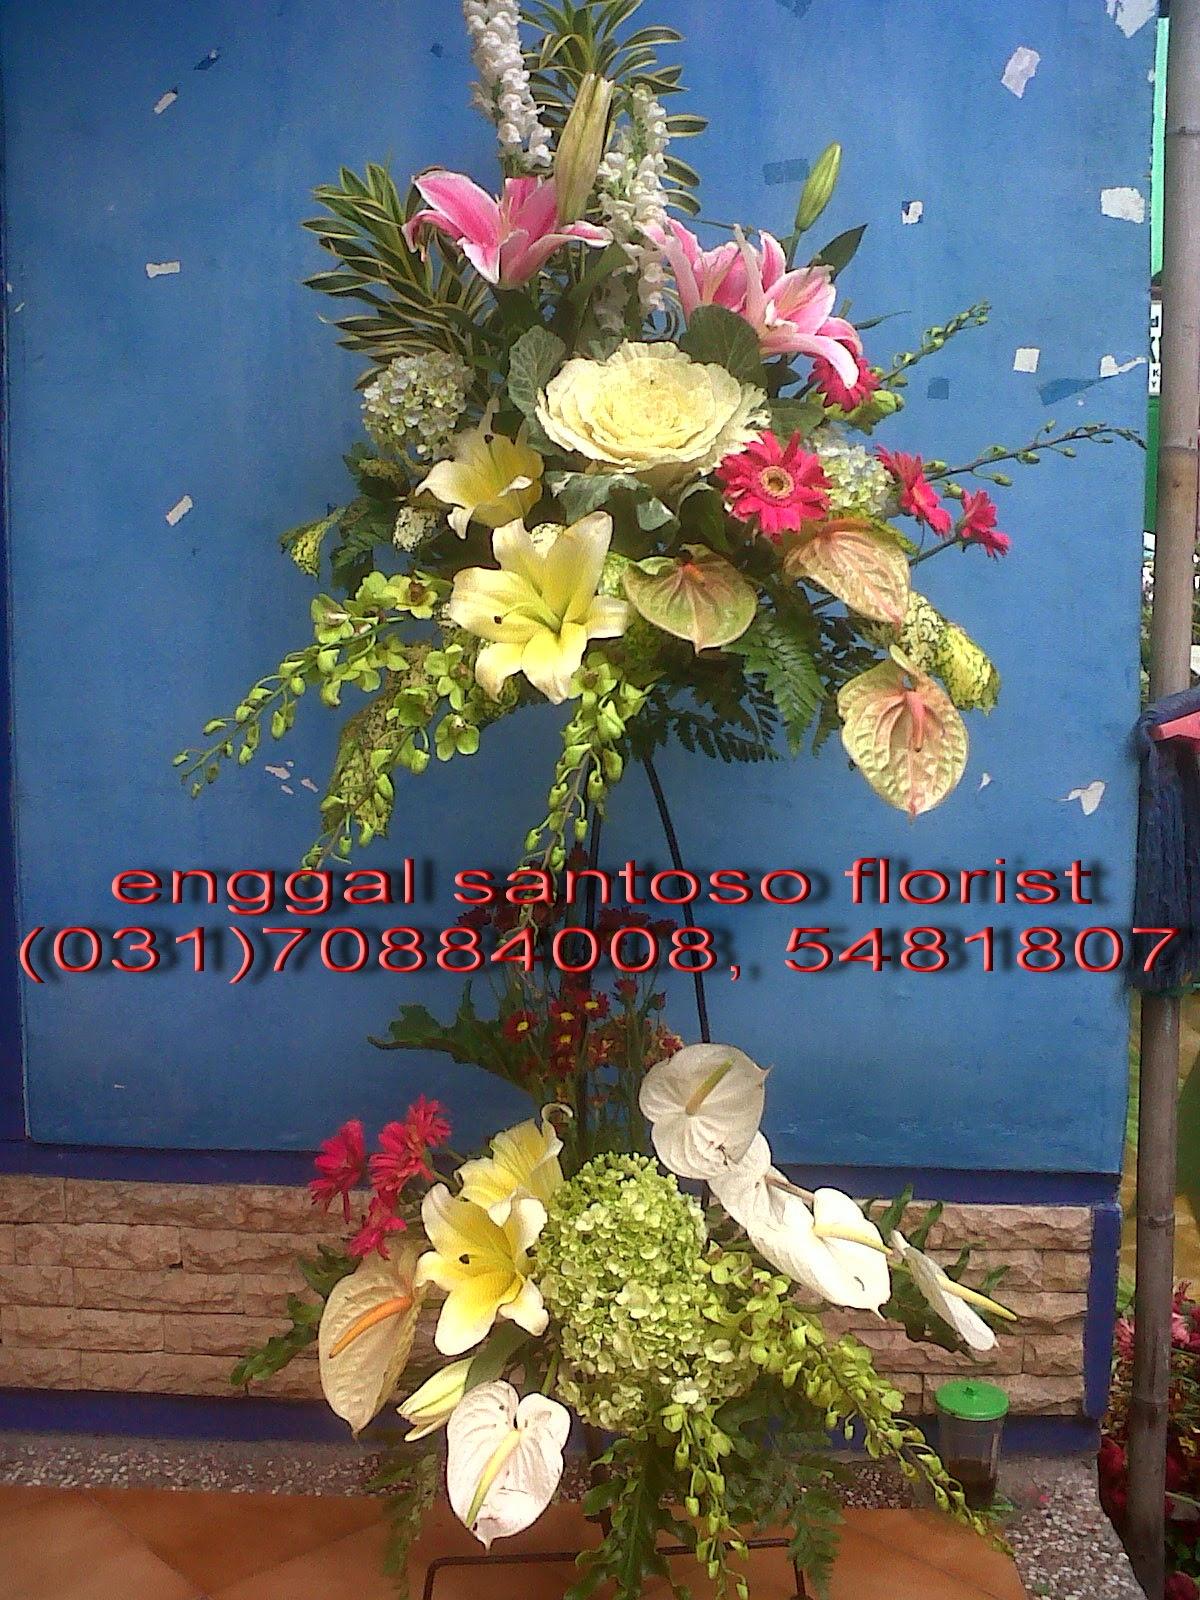 rangkaian karangan bunga pernikahan standing toko bunga sidoarjo florist